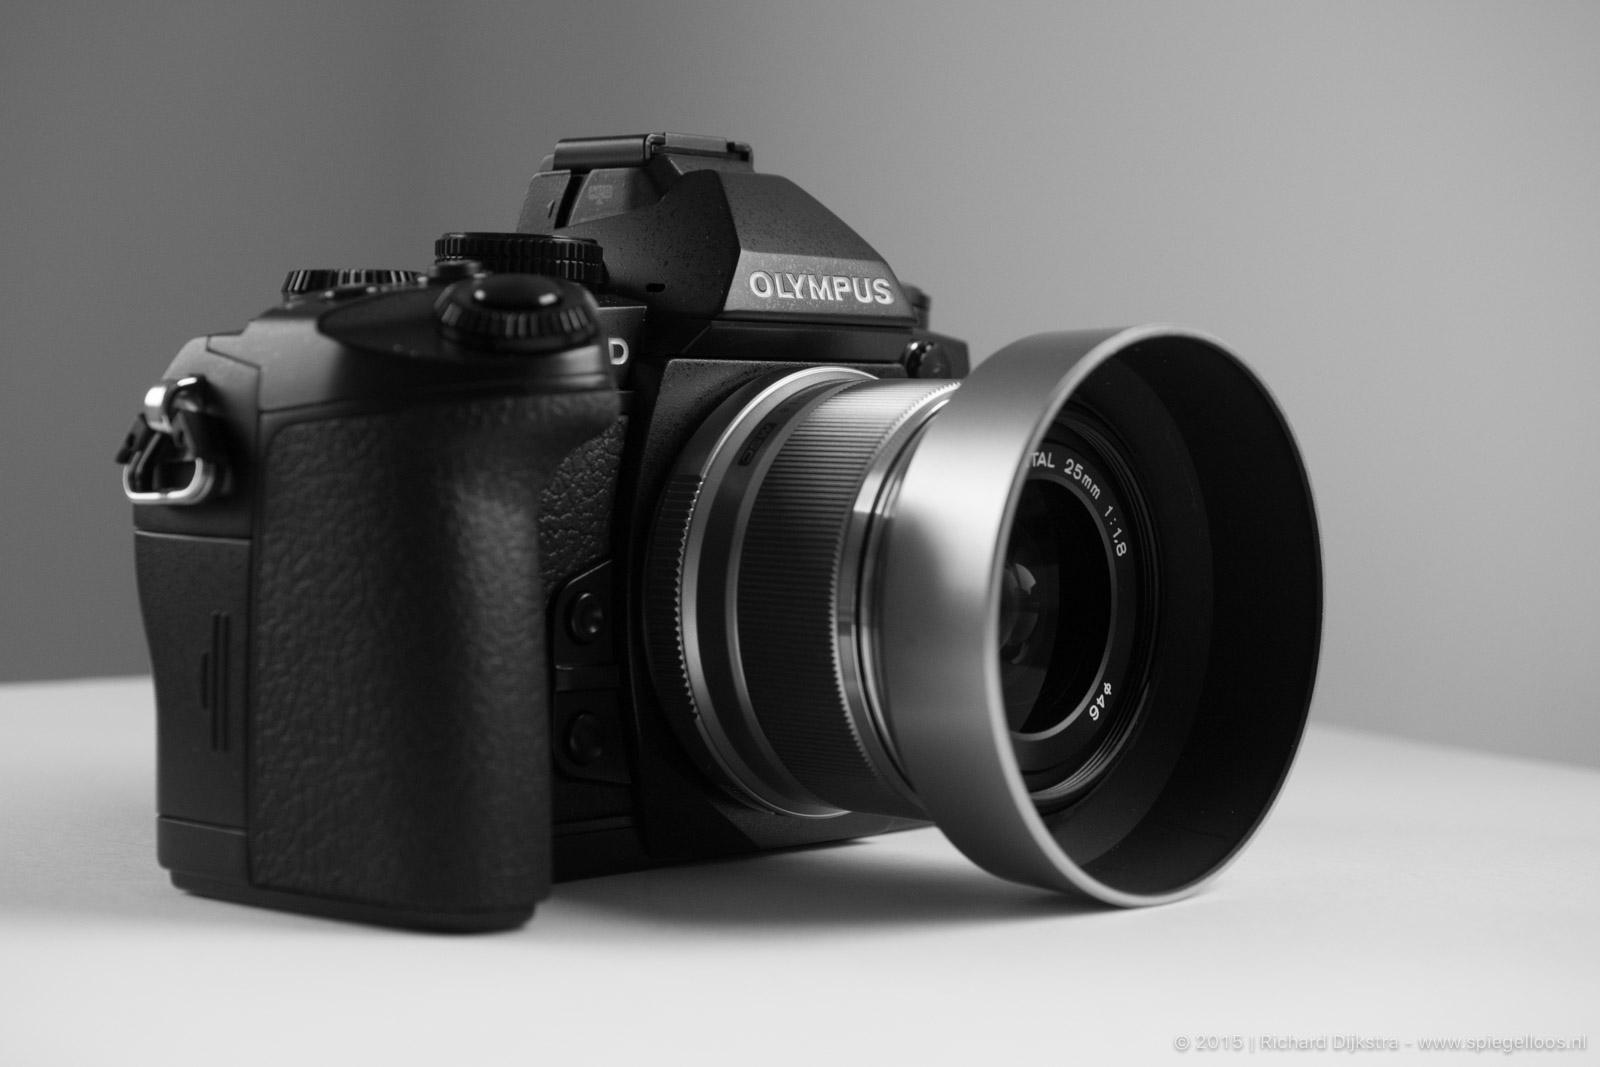 Olympus 25mm shot